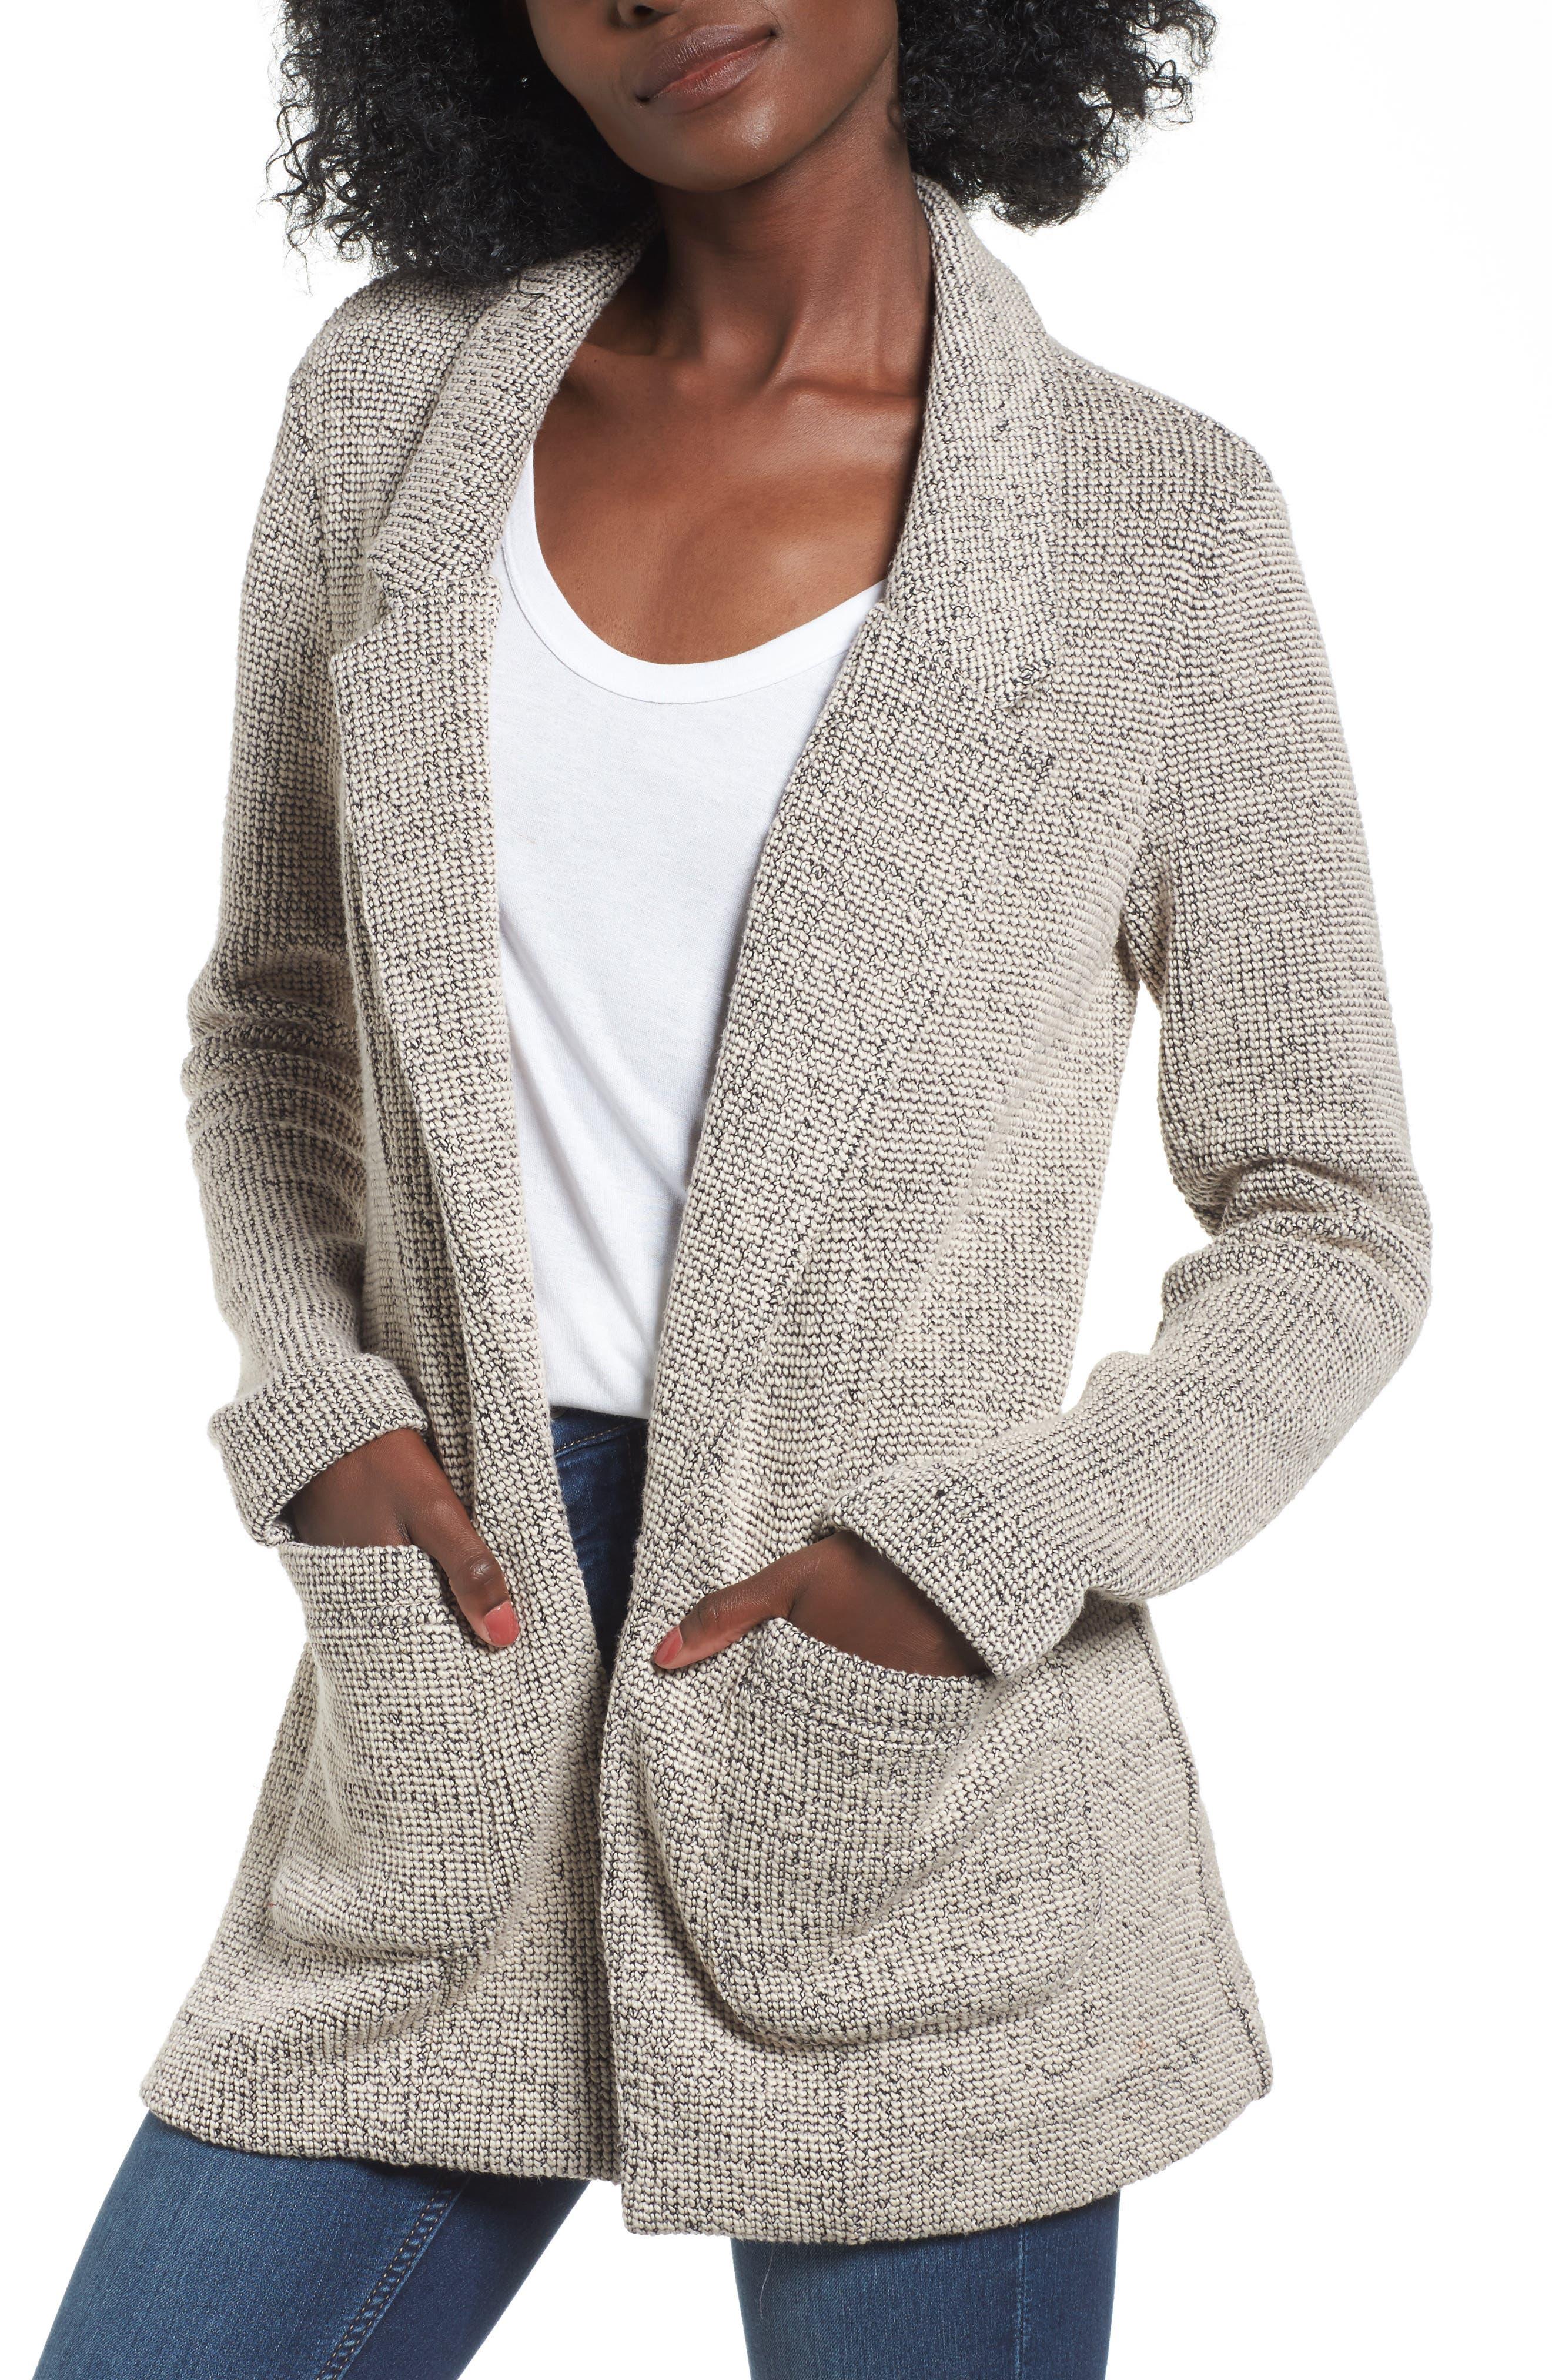 Alternate Image 1 Selected - ASTR the Label Tweed Blazer